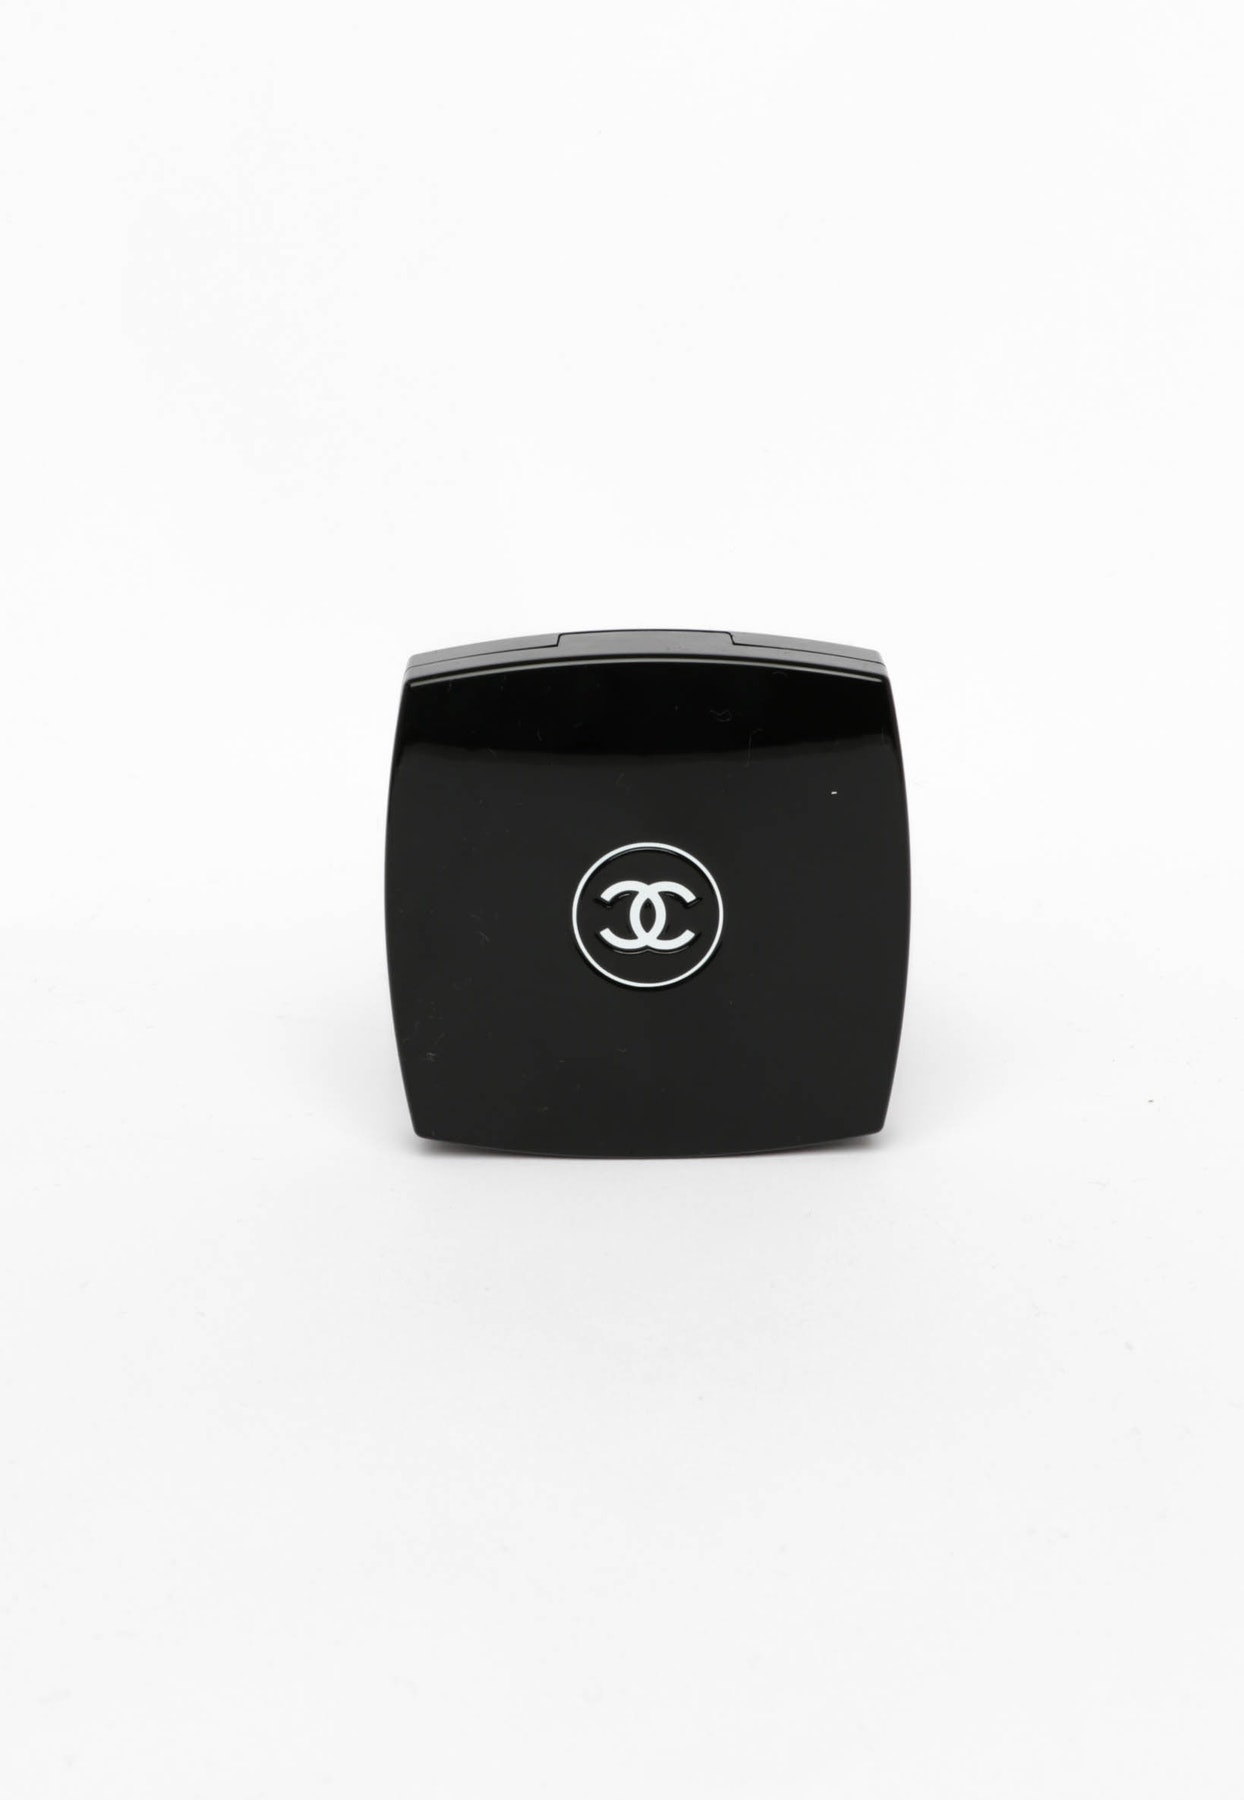 Chanel Poudre Universelle Compacte Natural Finish Pressed Powder 10 Libre Limpide Bobbi Brown Onceit